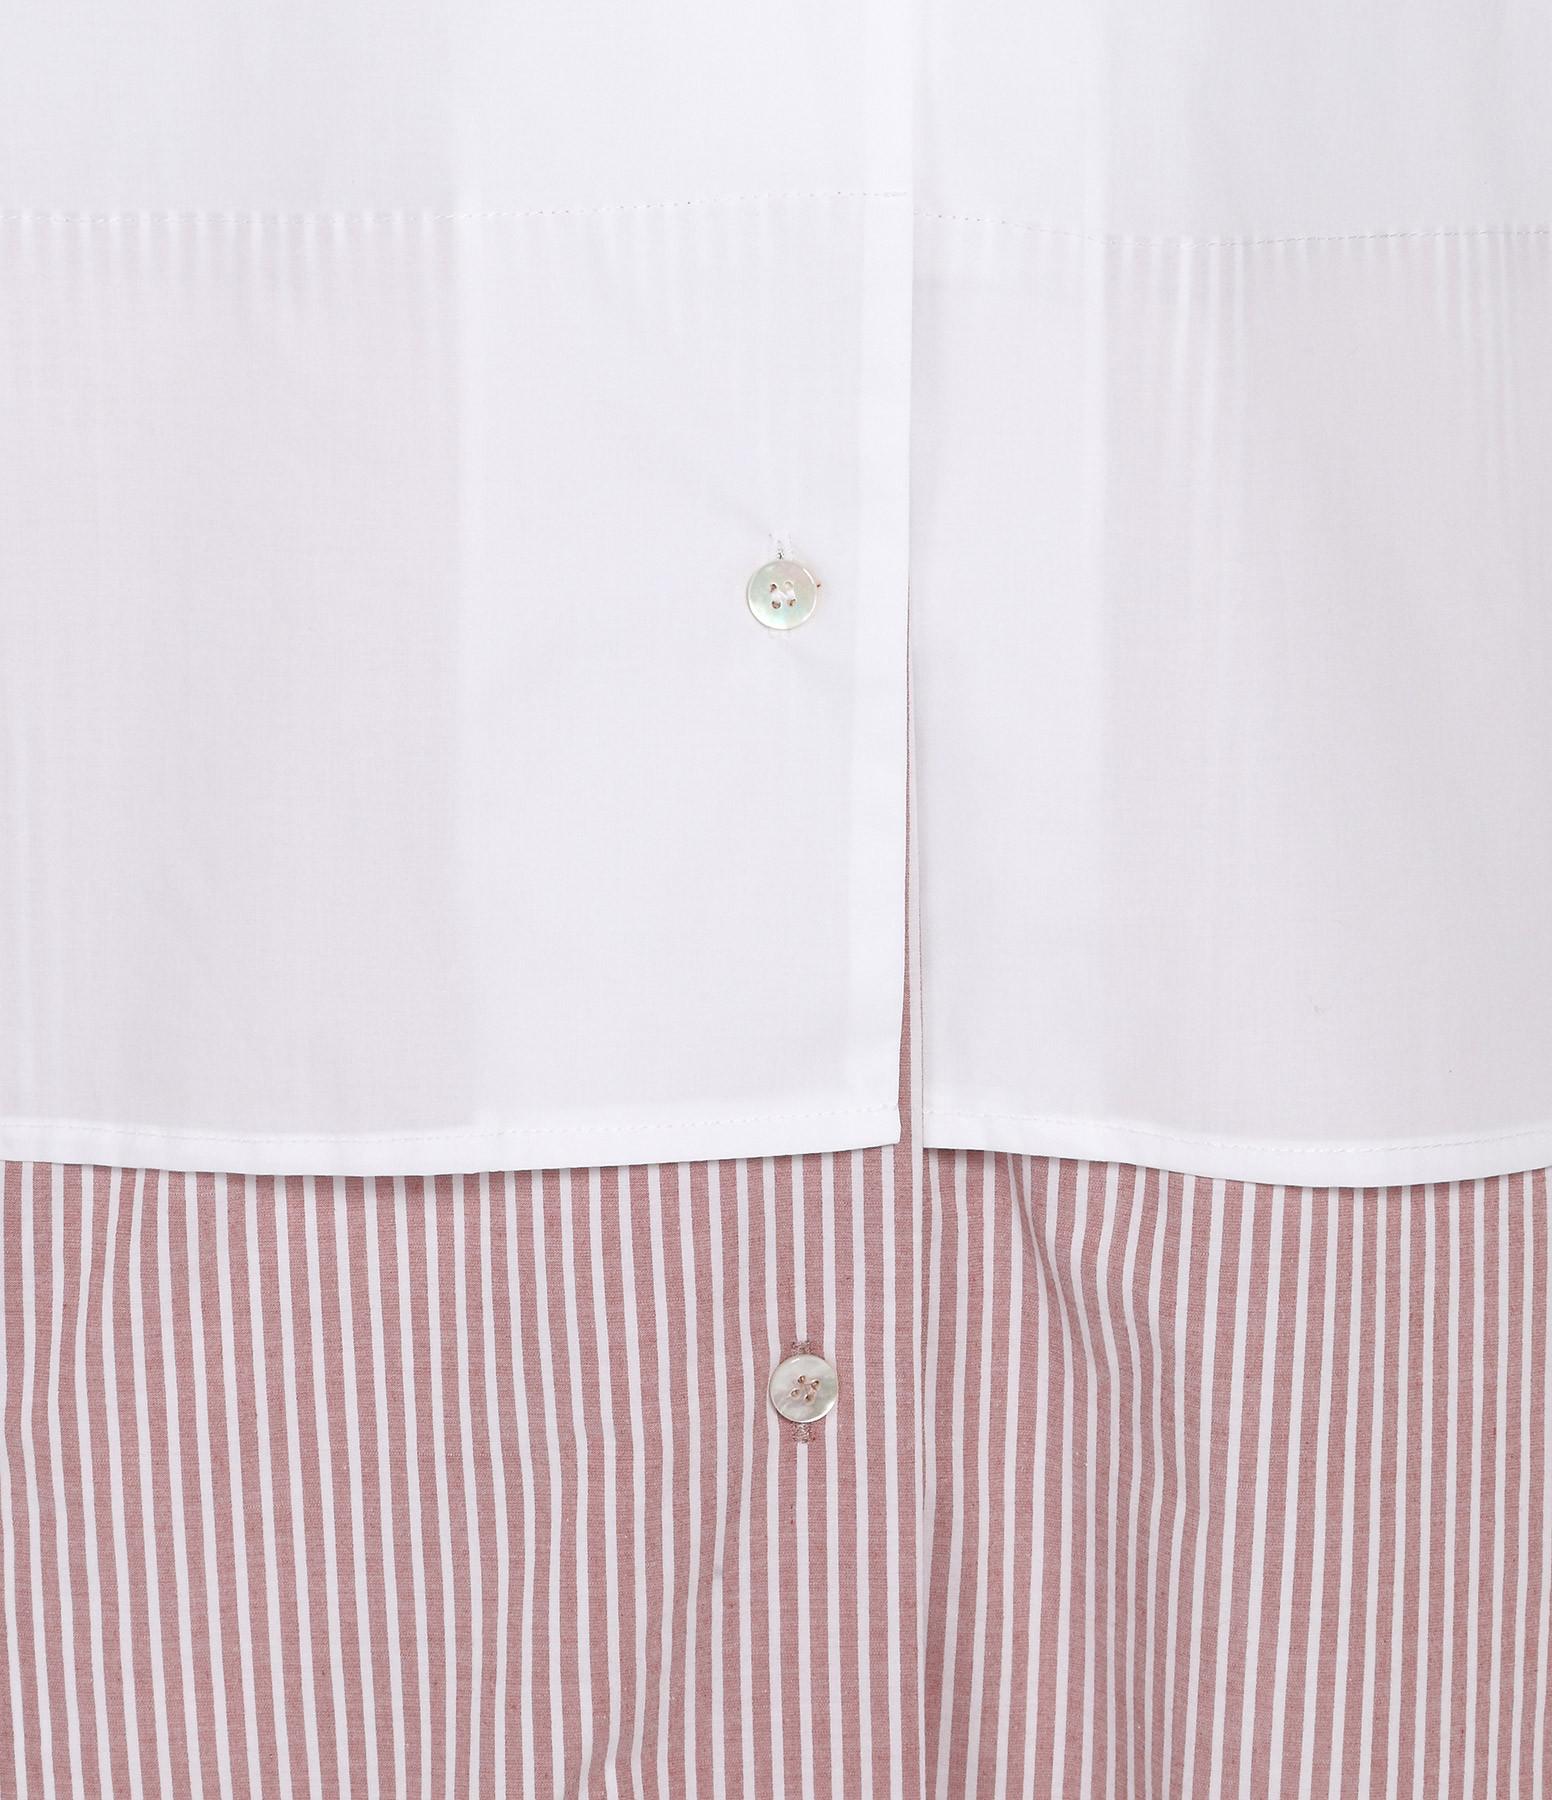 Chemise Maison Robe Mm6 Blanc Margiela w4nvCqtUT